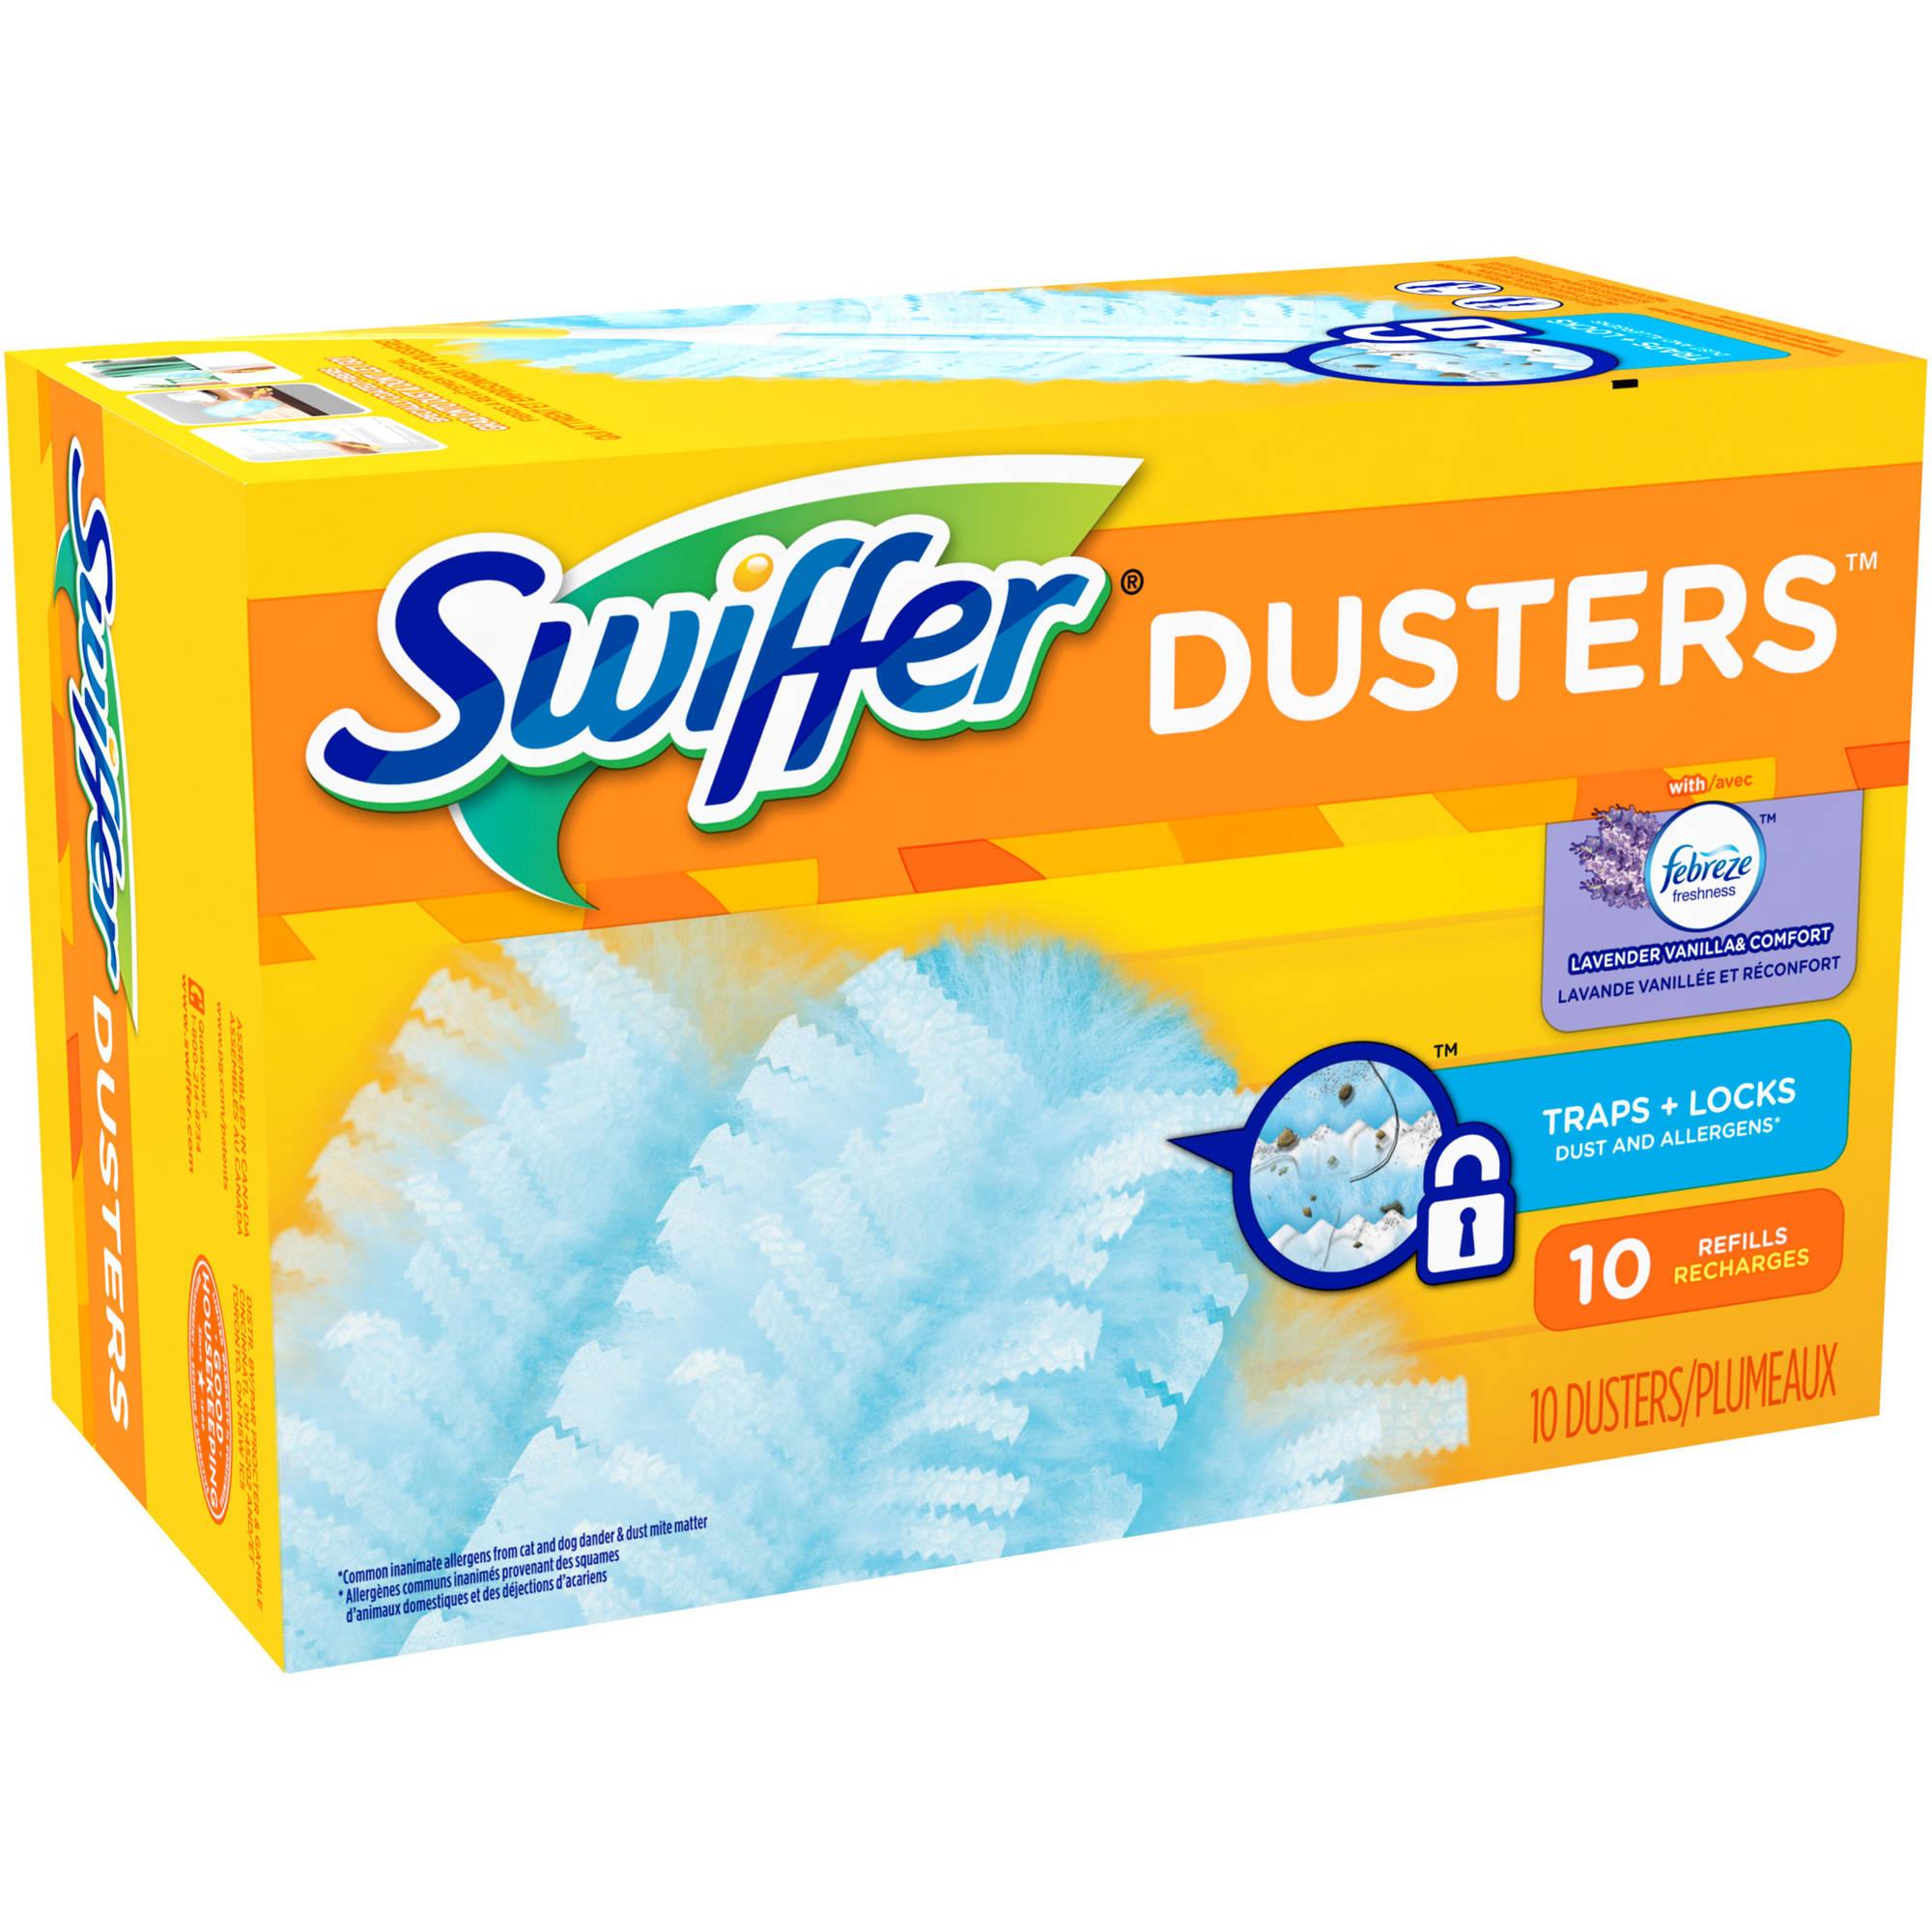 Swiffer With Febreze Dusters Refills, Fresh Scent Lavender Vanilla & Comfort , 10 ct